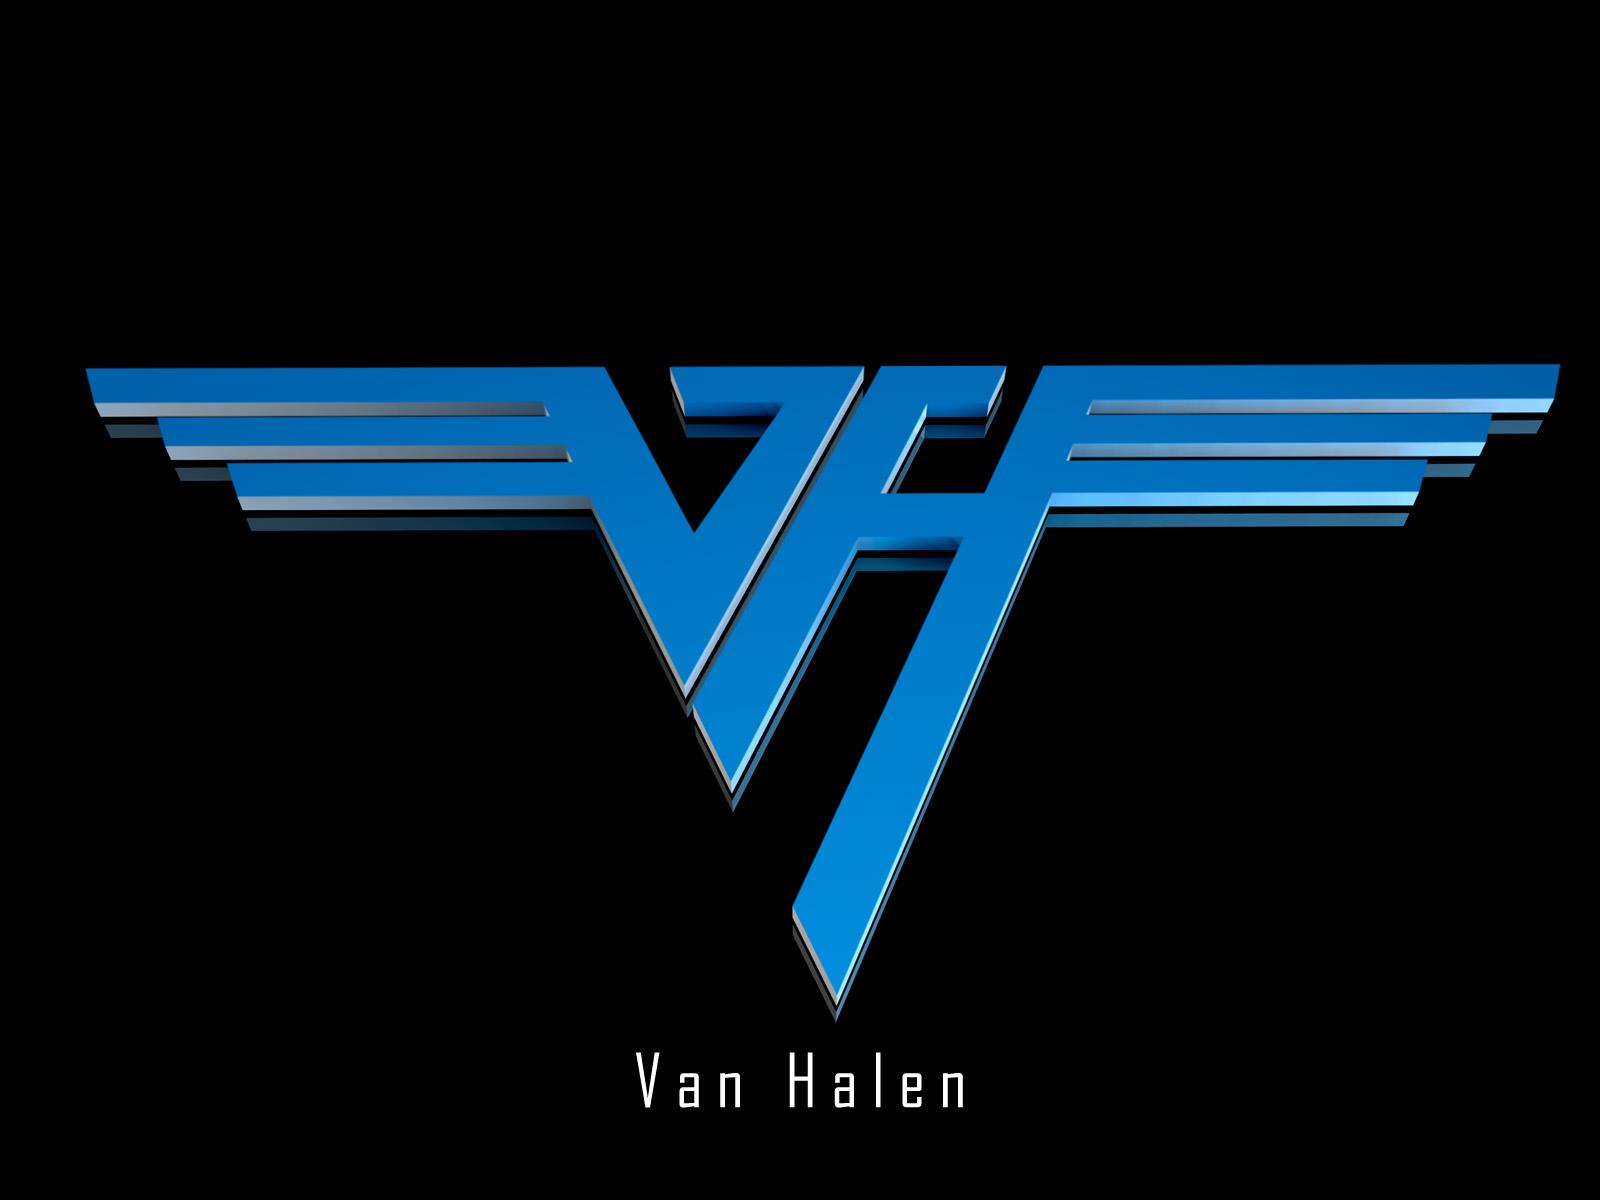 Van Halen by CrocodileHunter 1600x1200